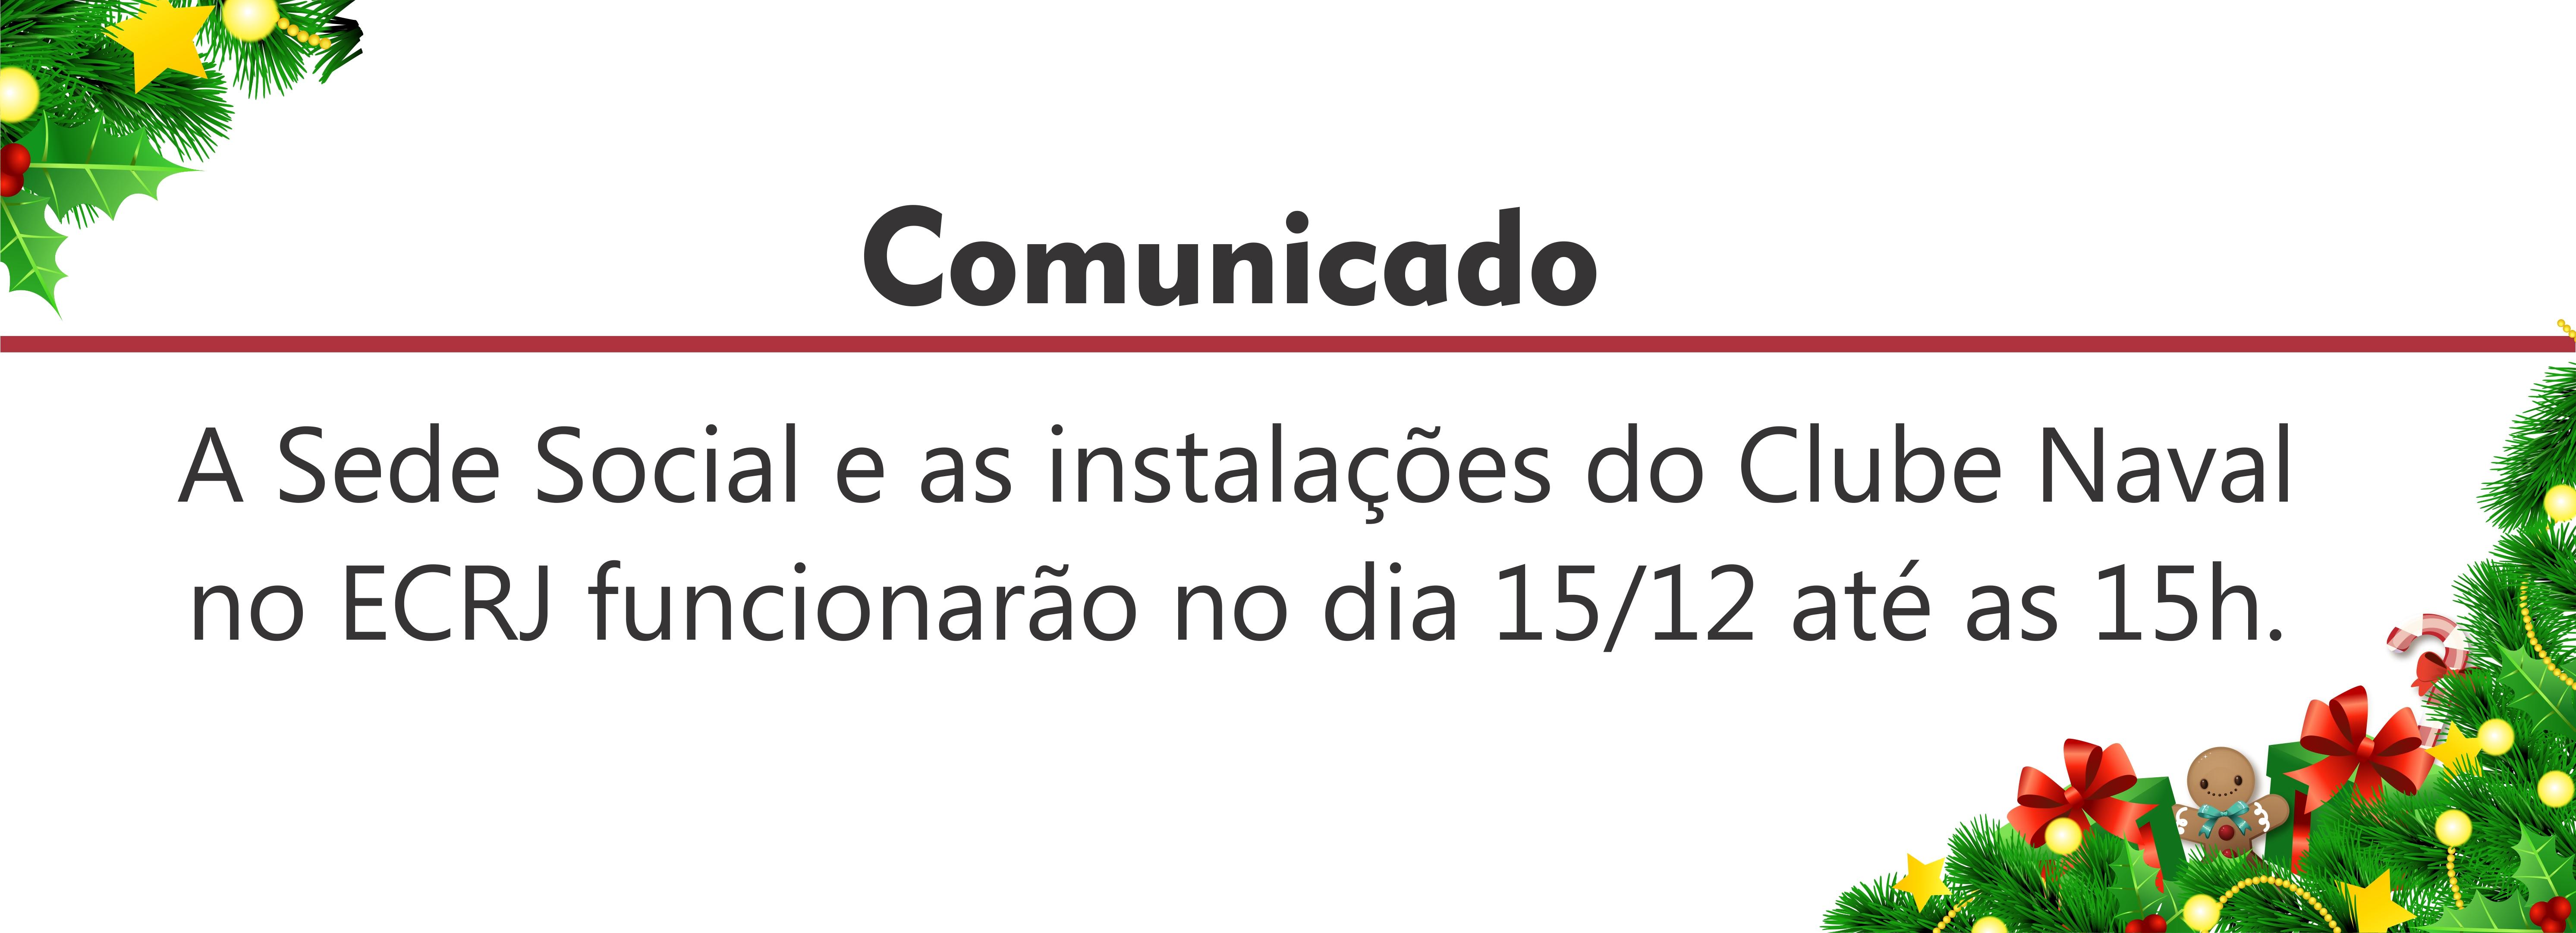 https://www.clubenaval.org.br/novo/hor%C3%A1rio-de-funcionamento-da-sede-social-e-do-edif%C3%ADcio-cidade-do-rj-dia-1512#